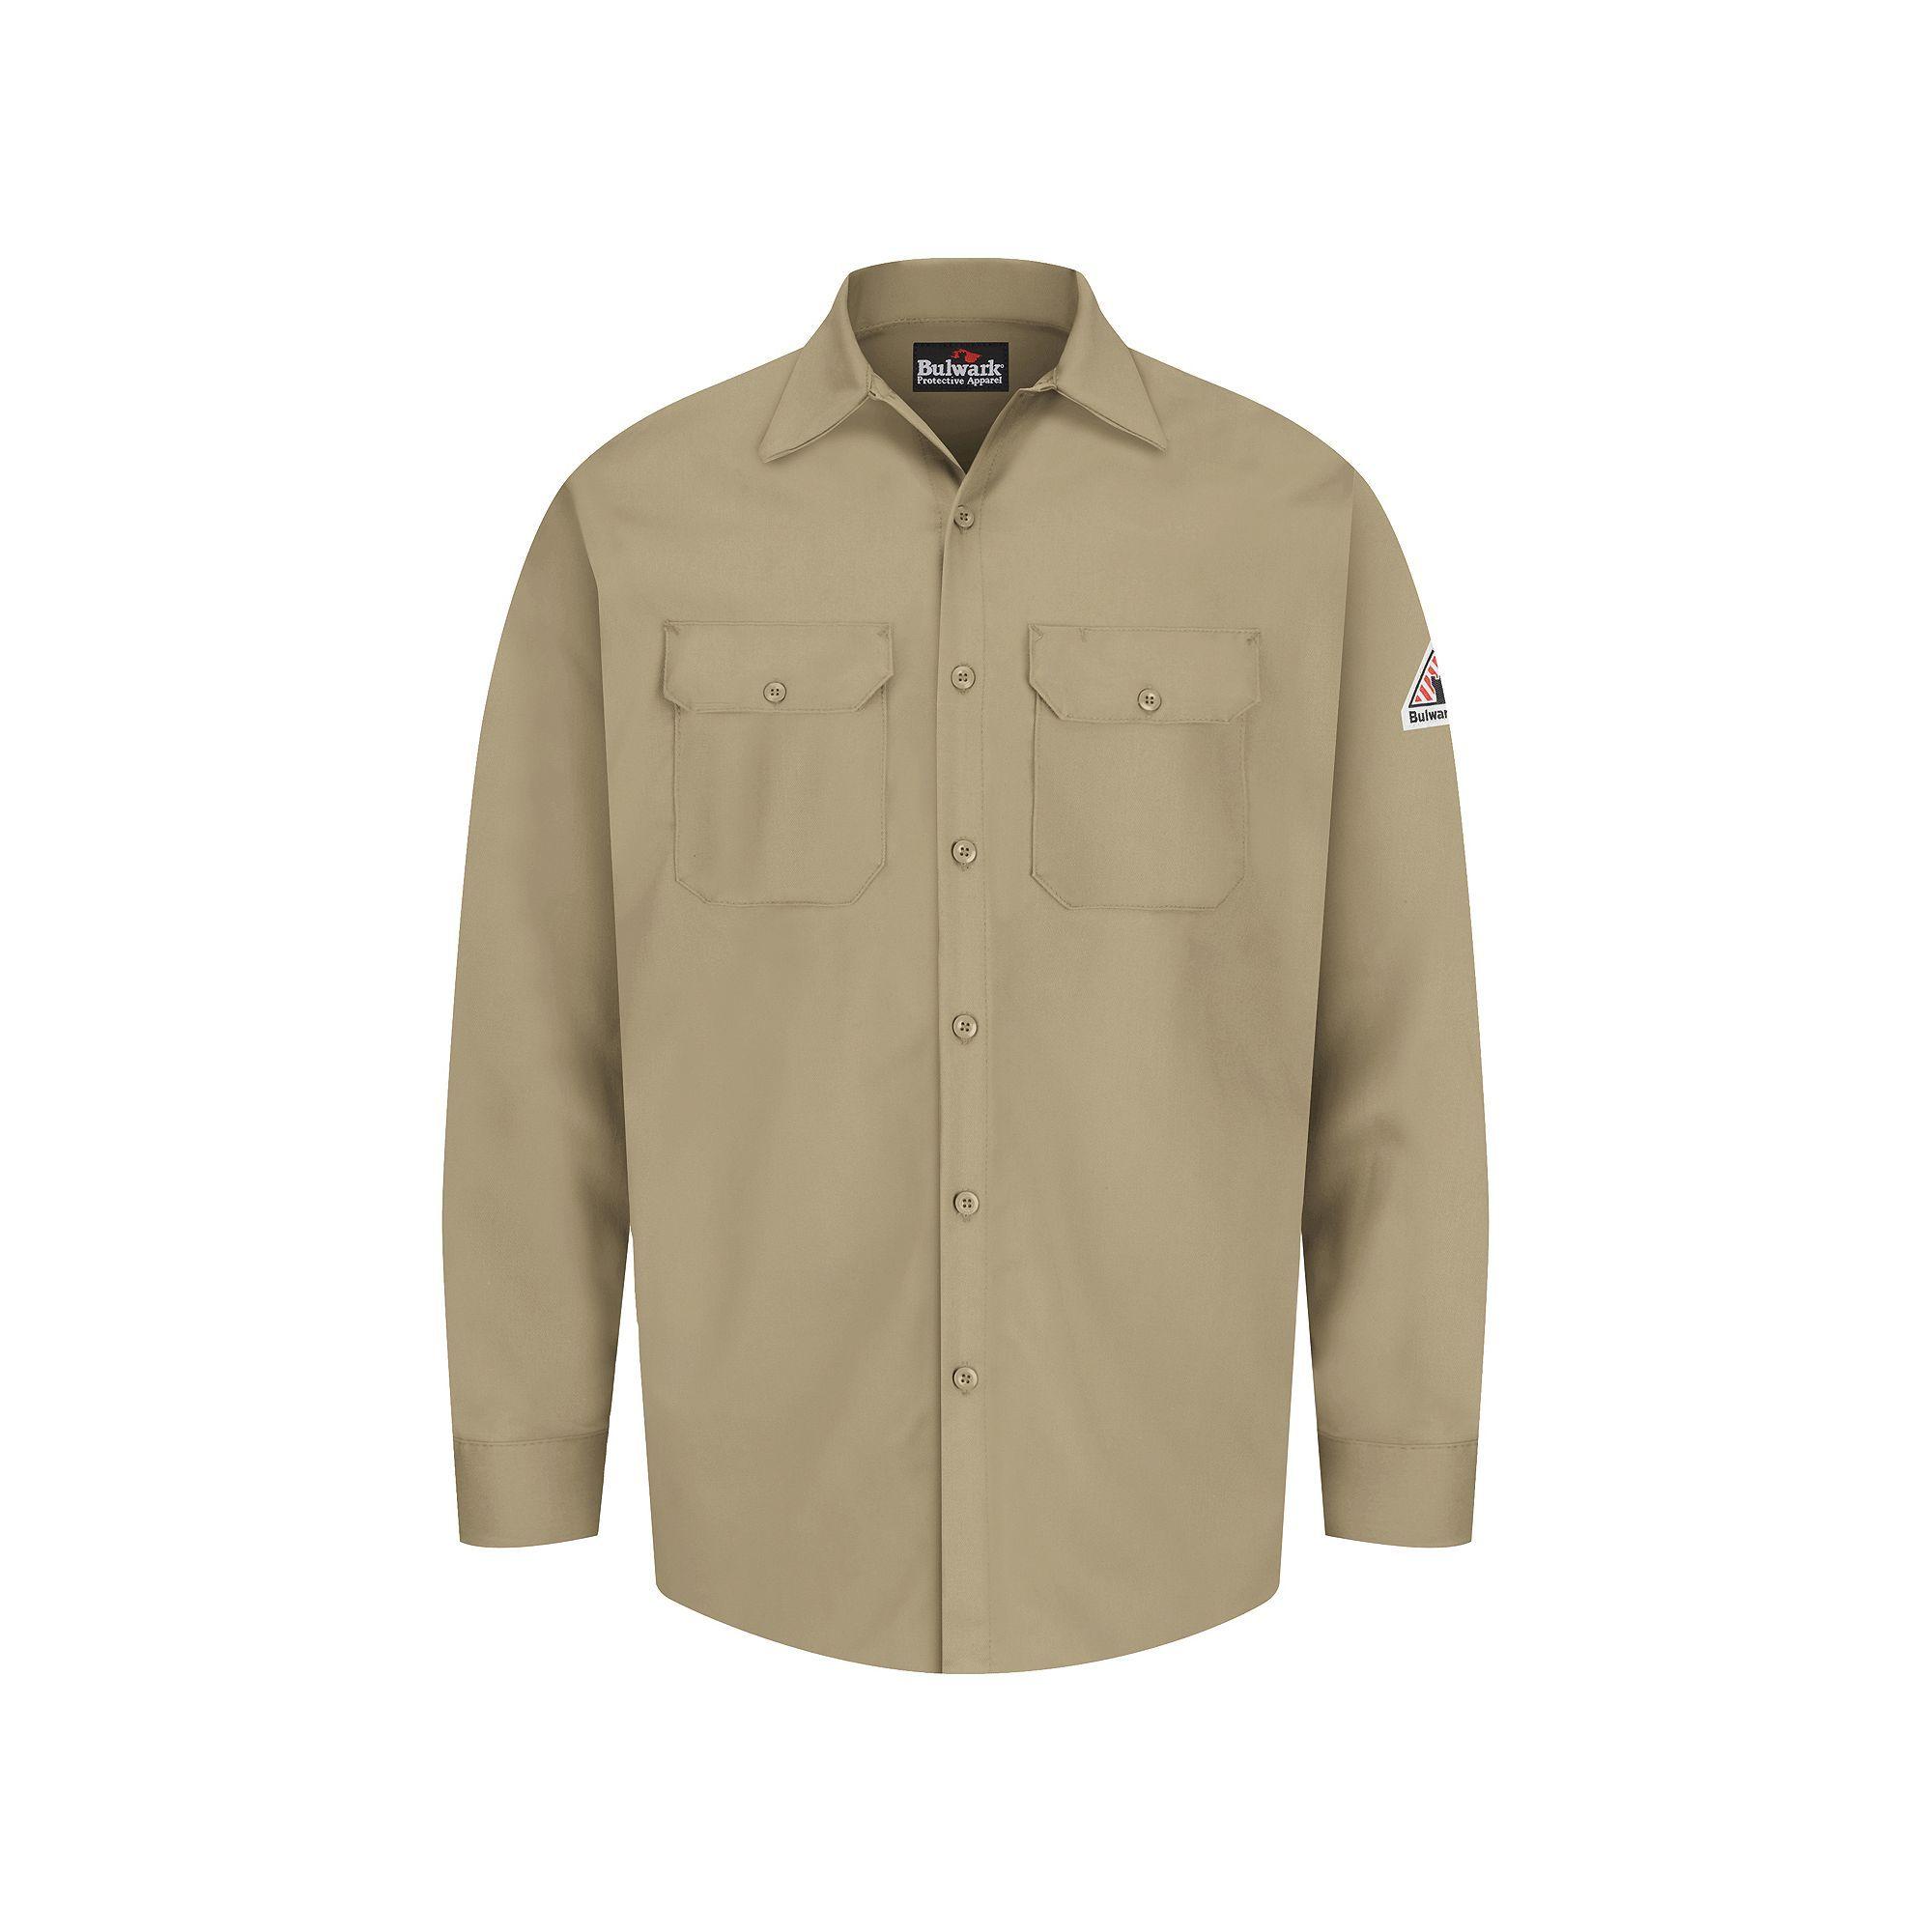 Men's Bulwark FR Excel FR Work Shirt, Size: Medium, Beig/Green (Beig/Khaki), Durable